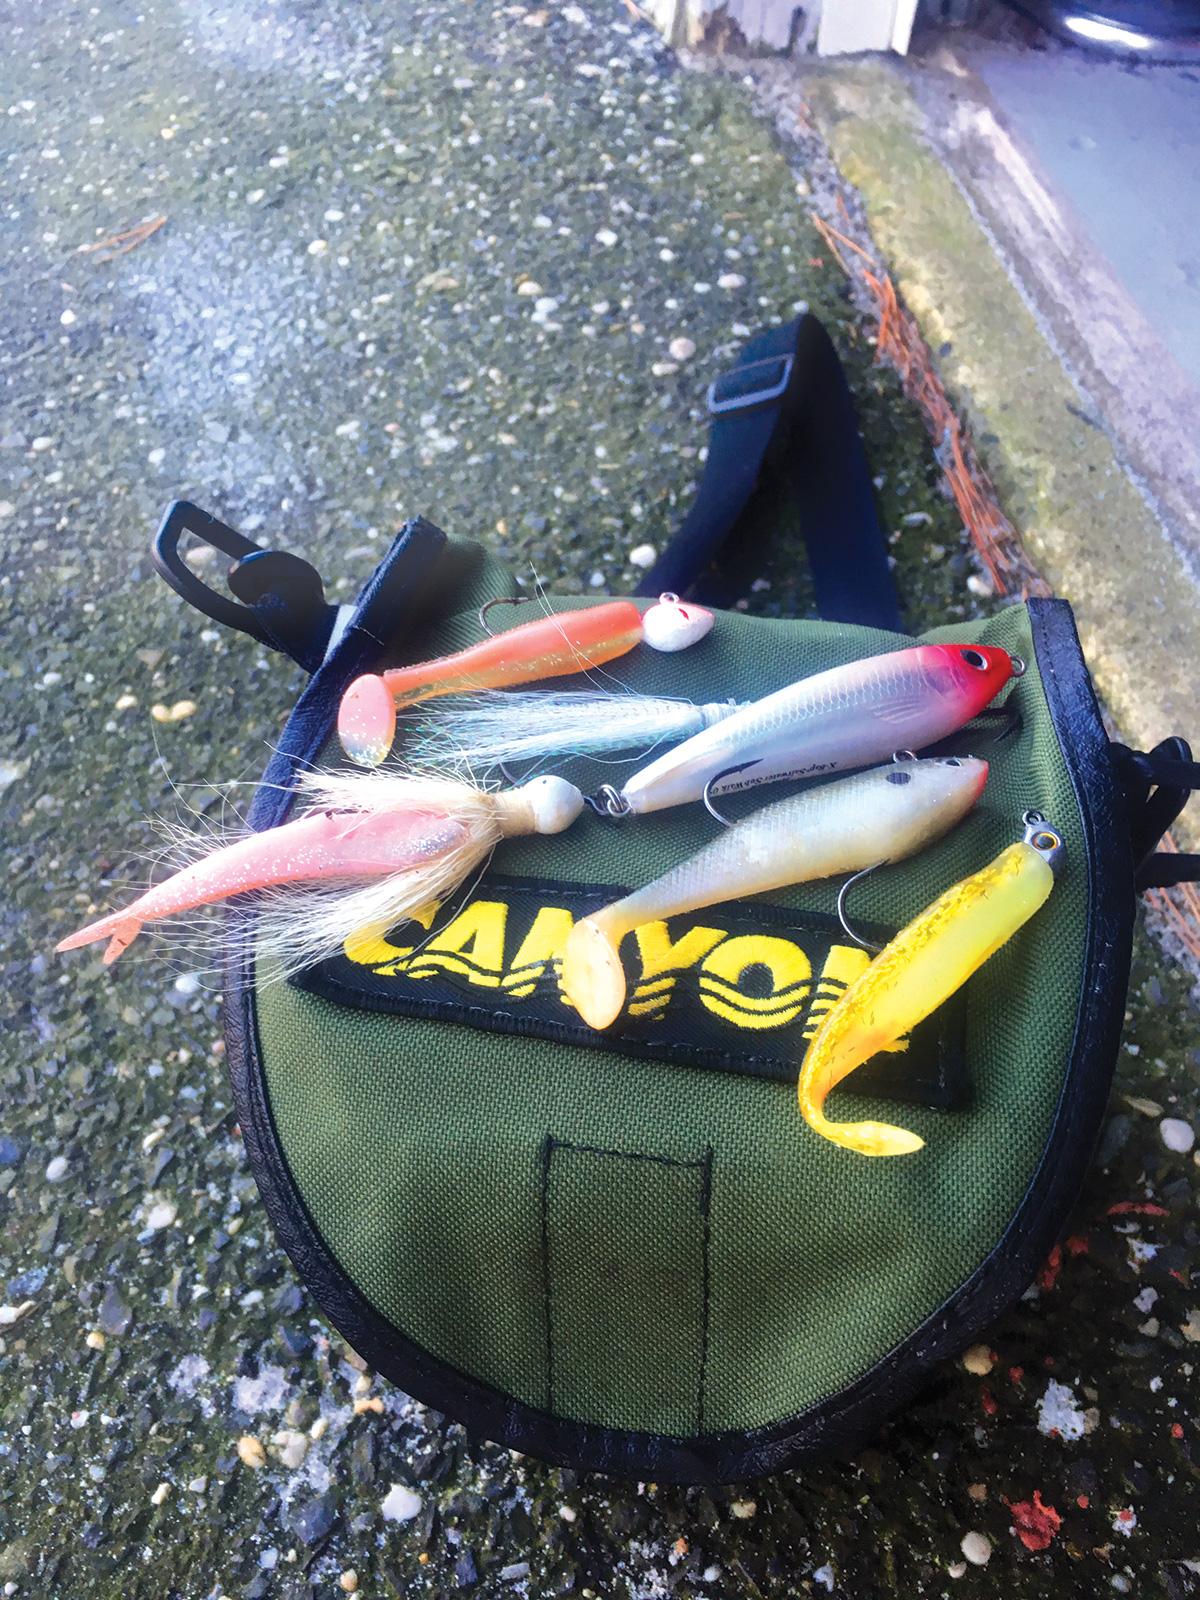 2018 4 Get Schooled Backwater Bridge Bass ARSENAL